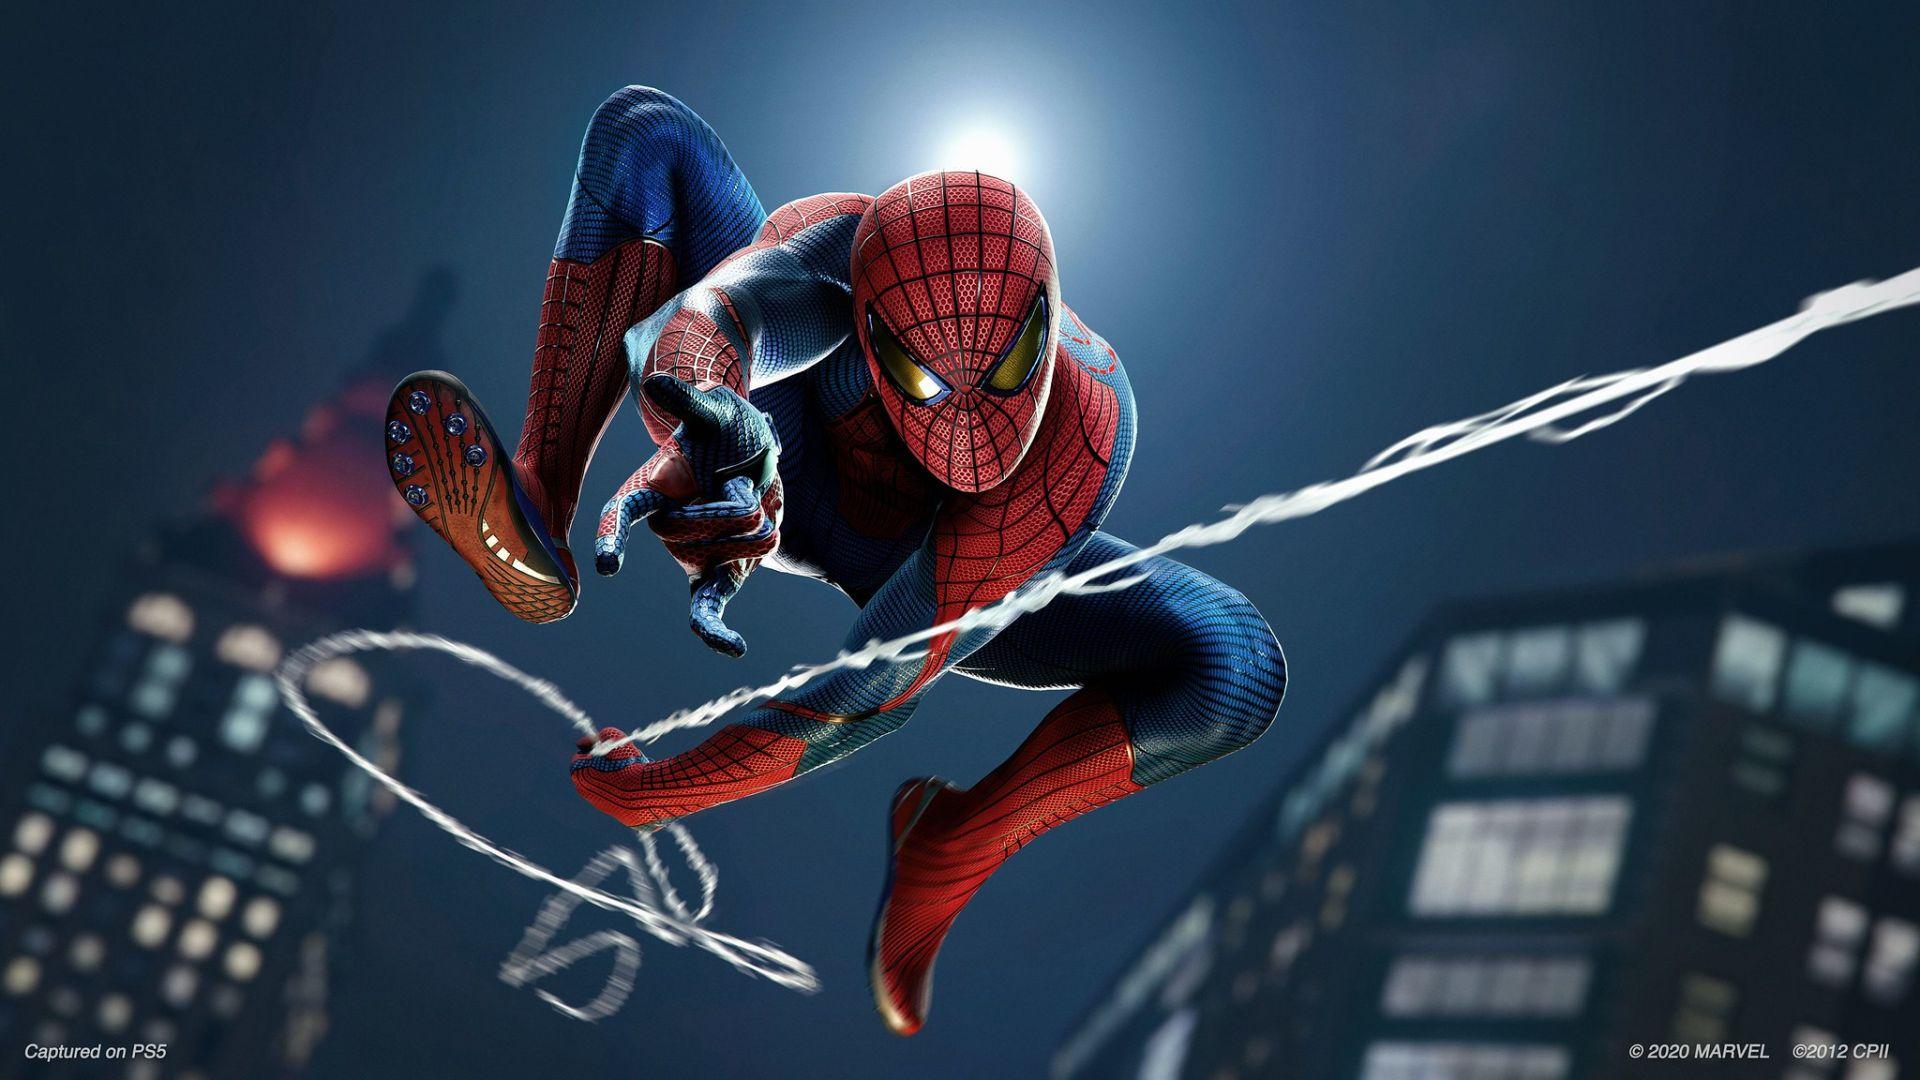 dettagli costumi marvel's spider-man